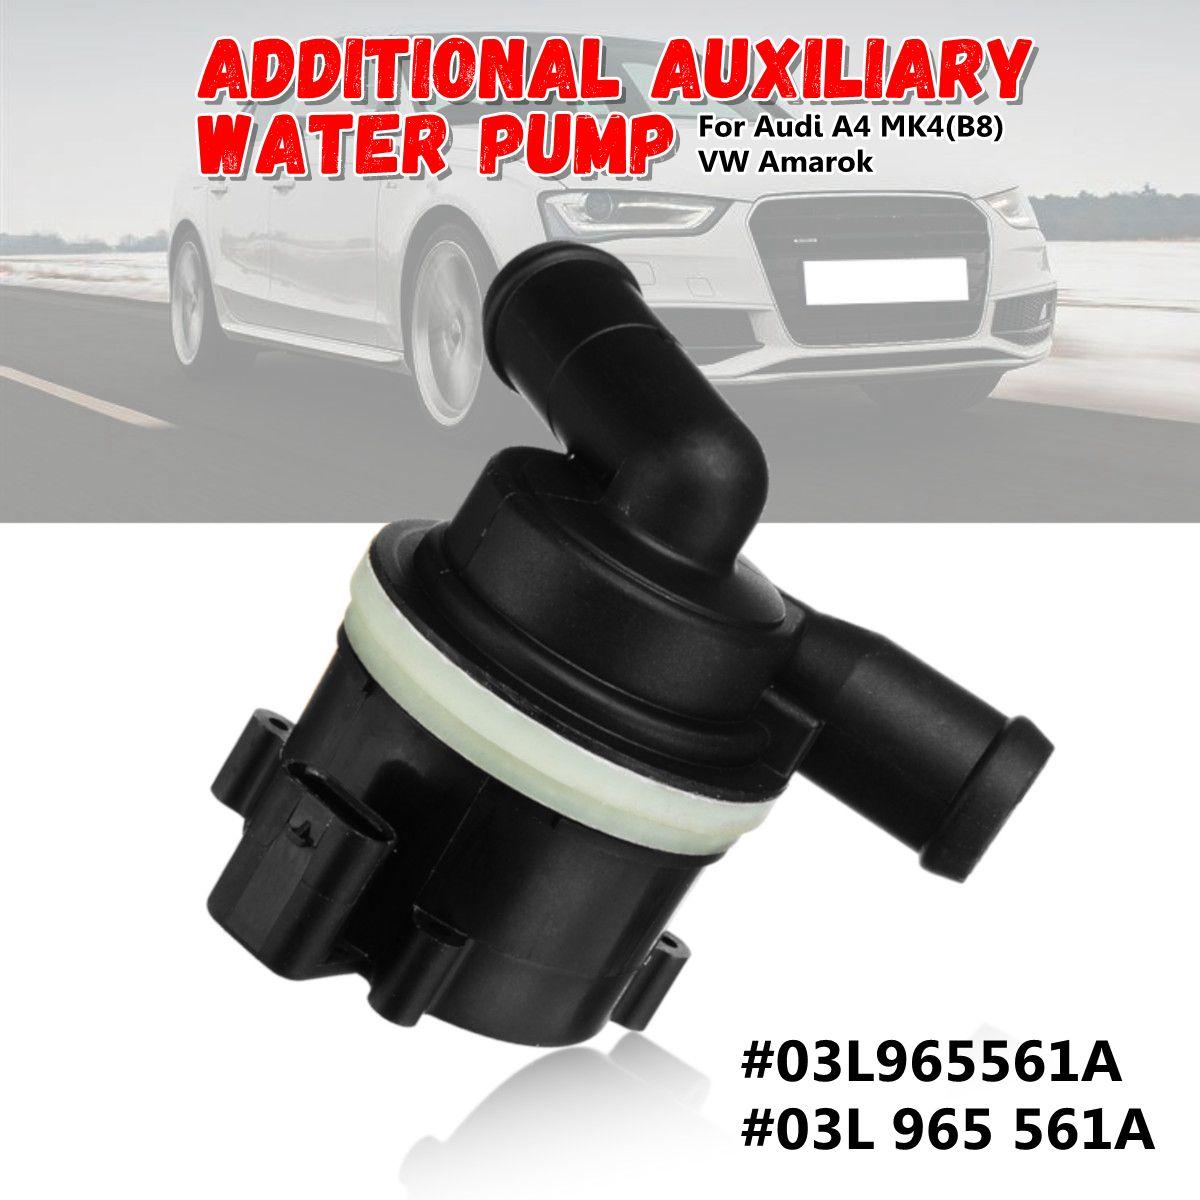 03L965561A 03L 965 561A refrigerante secundario bomba de agua auxiliar adicional para Audi A4 MK4 (B8) para VW Amarok 2008-2015